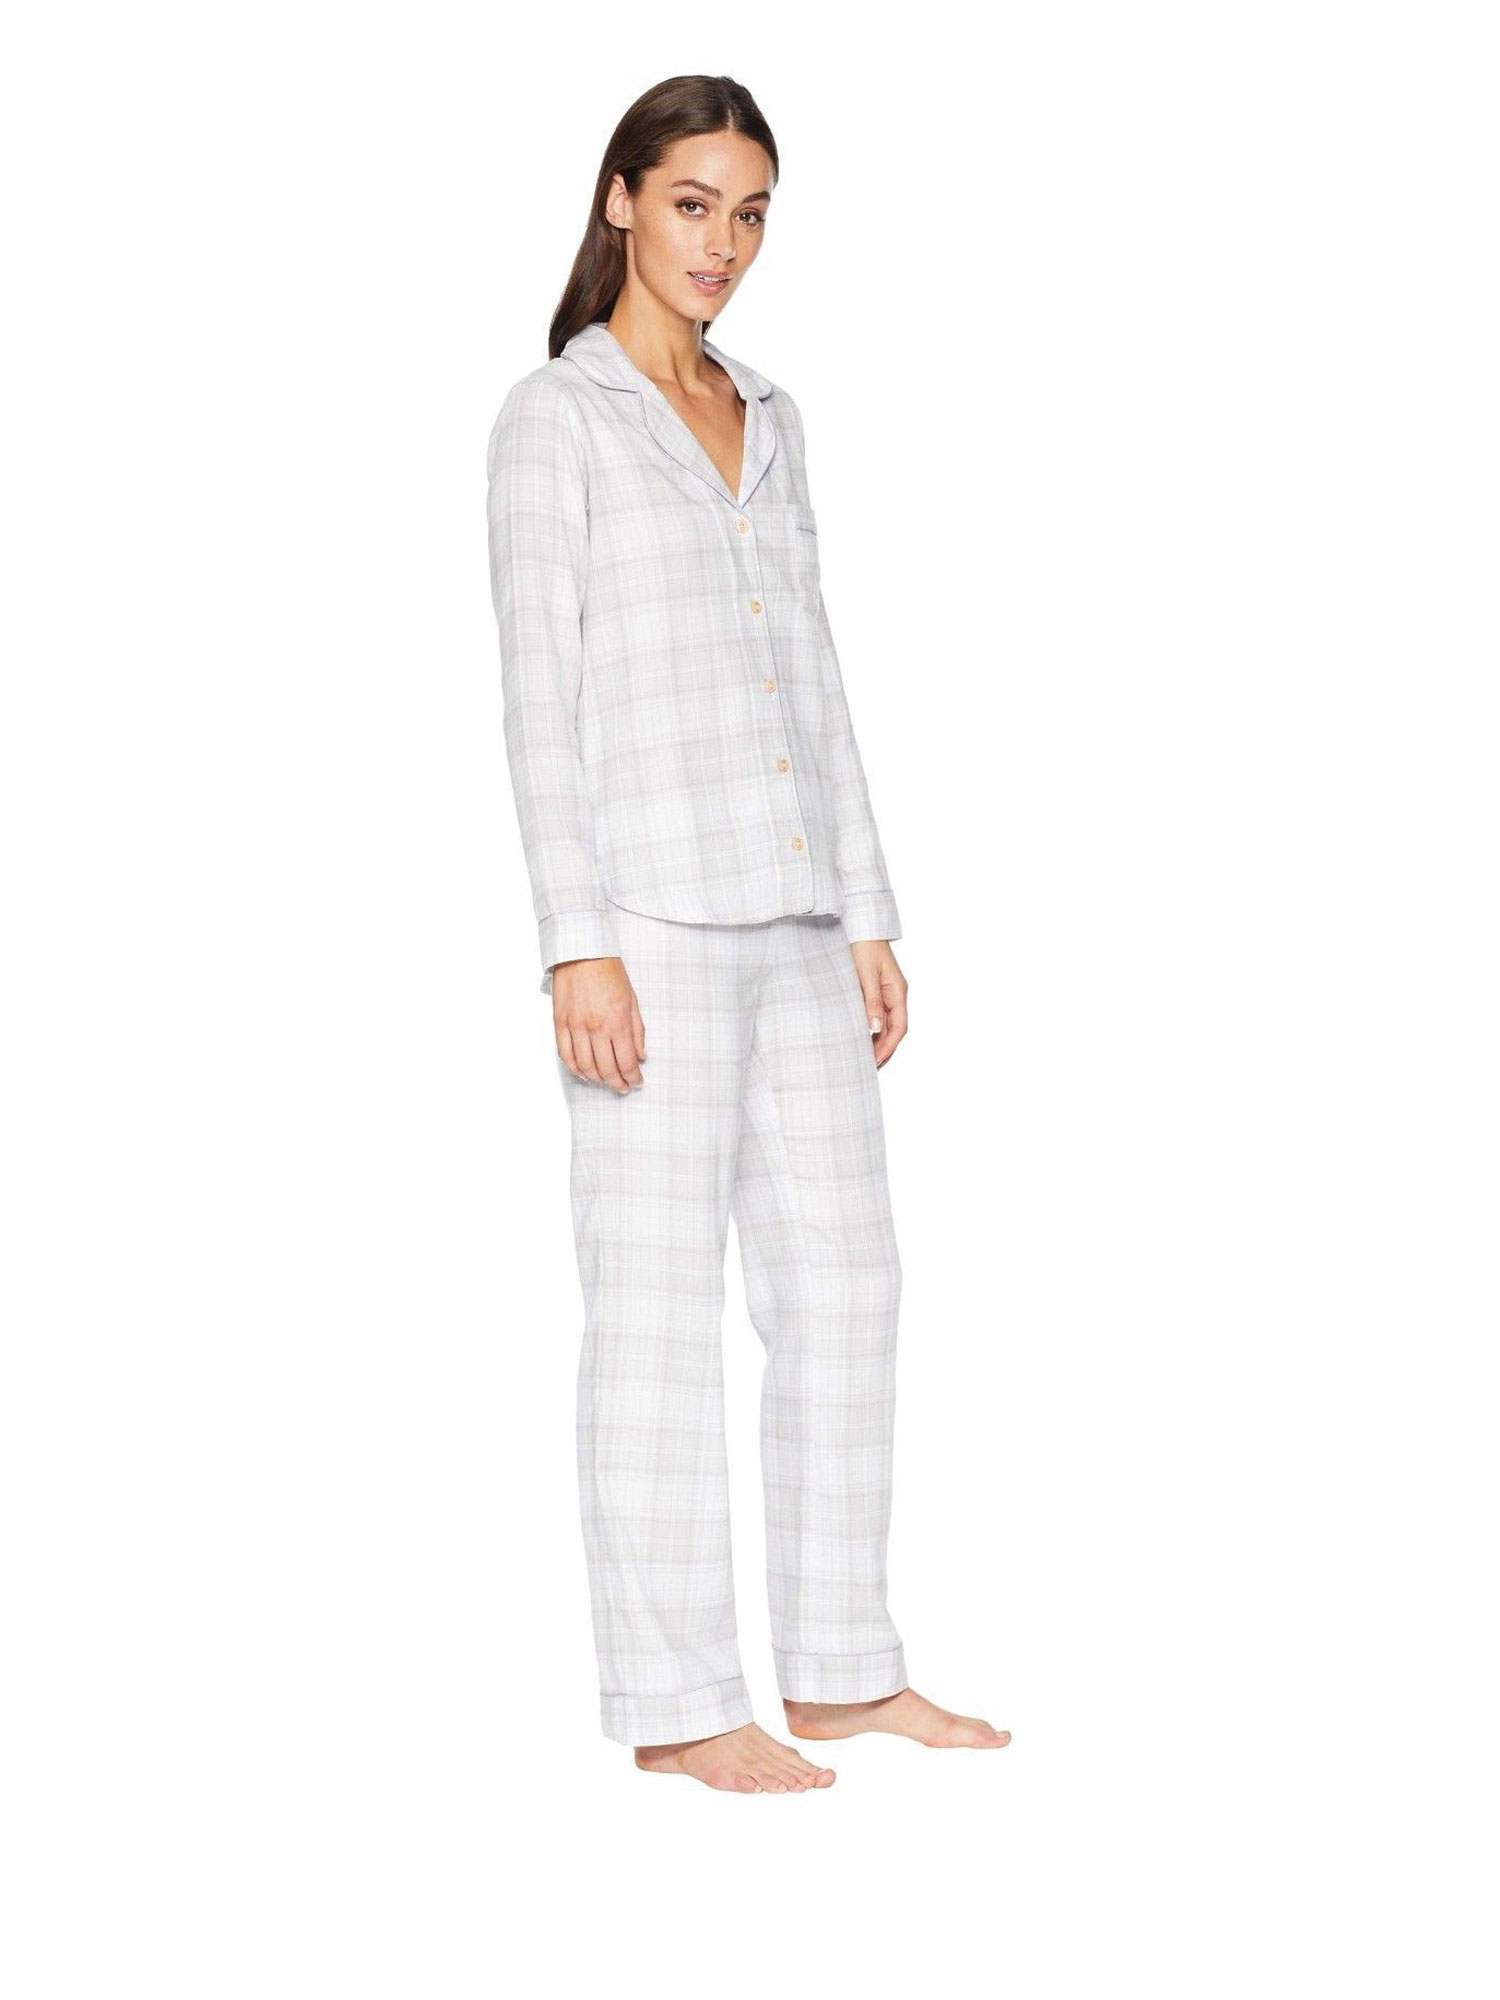 4457c48383 UGG Raven Flannel Women s Sleepwear Set 1101798 - Walmart.com